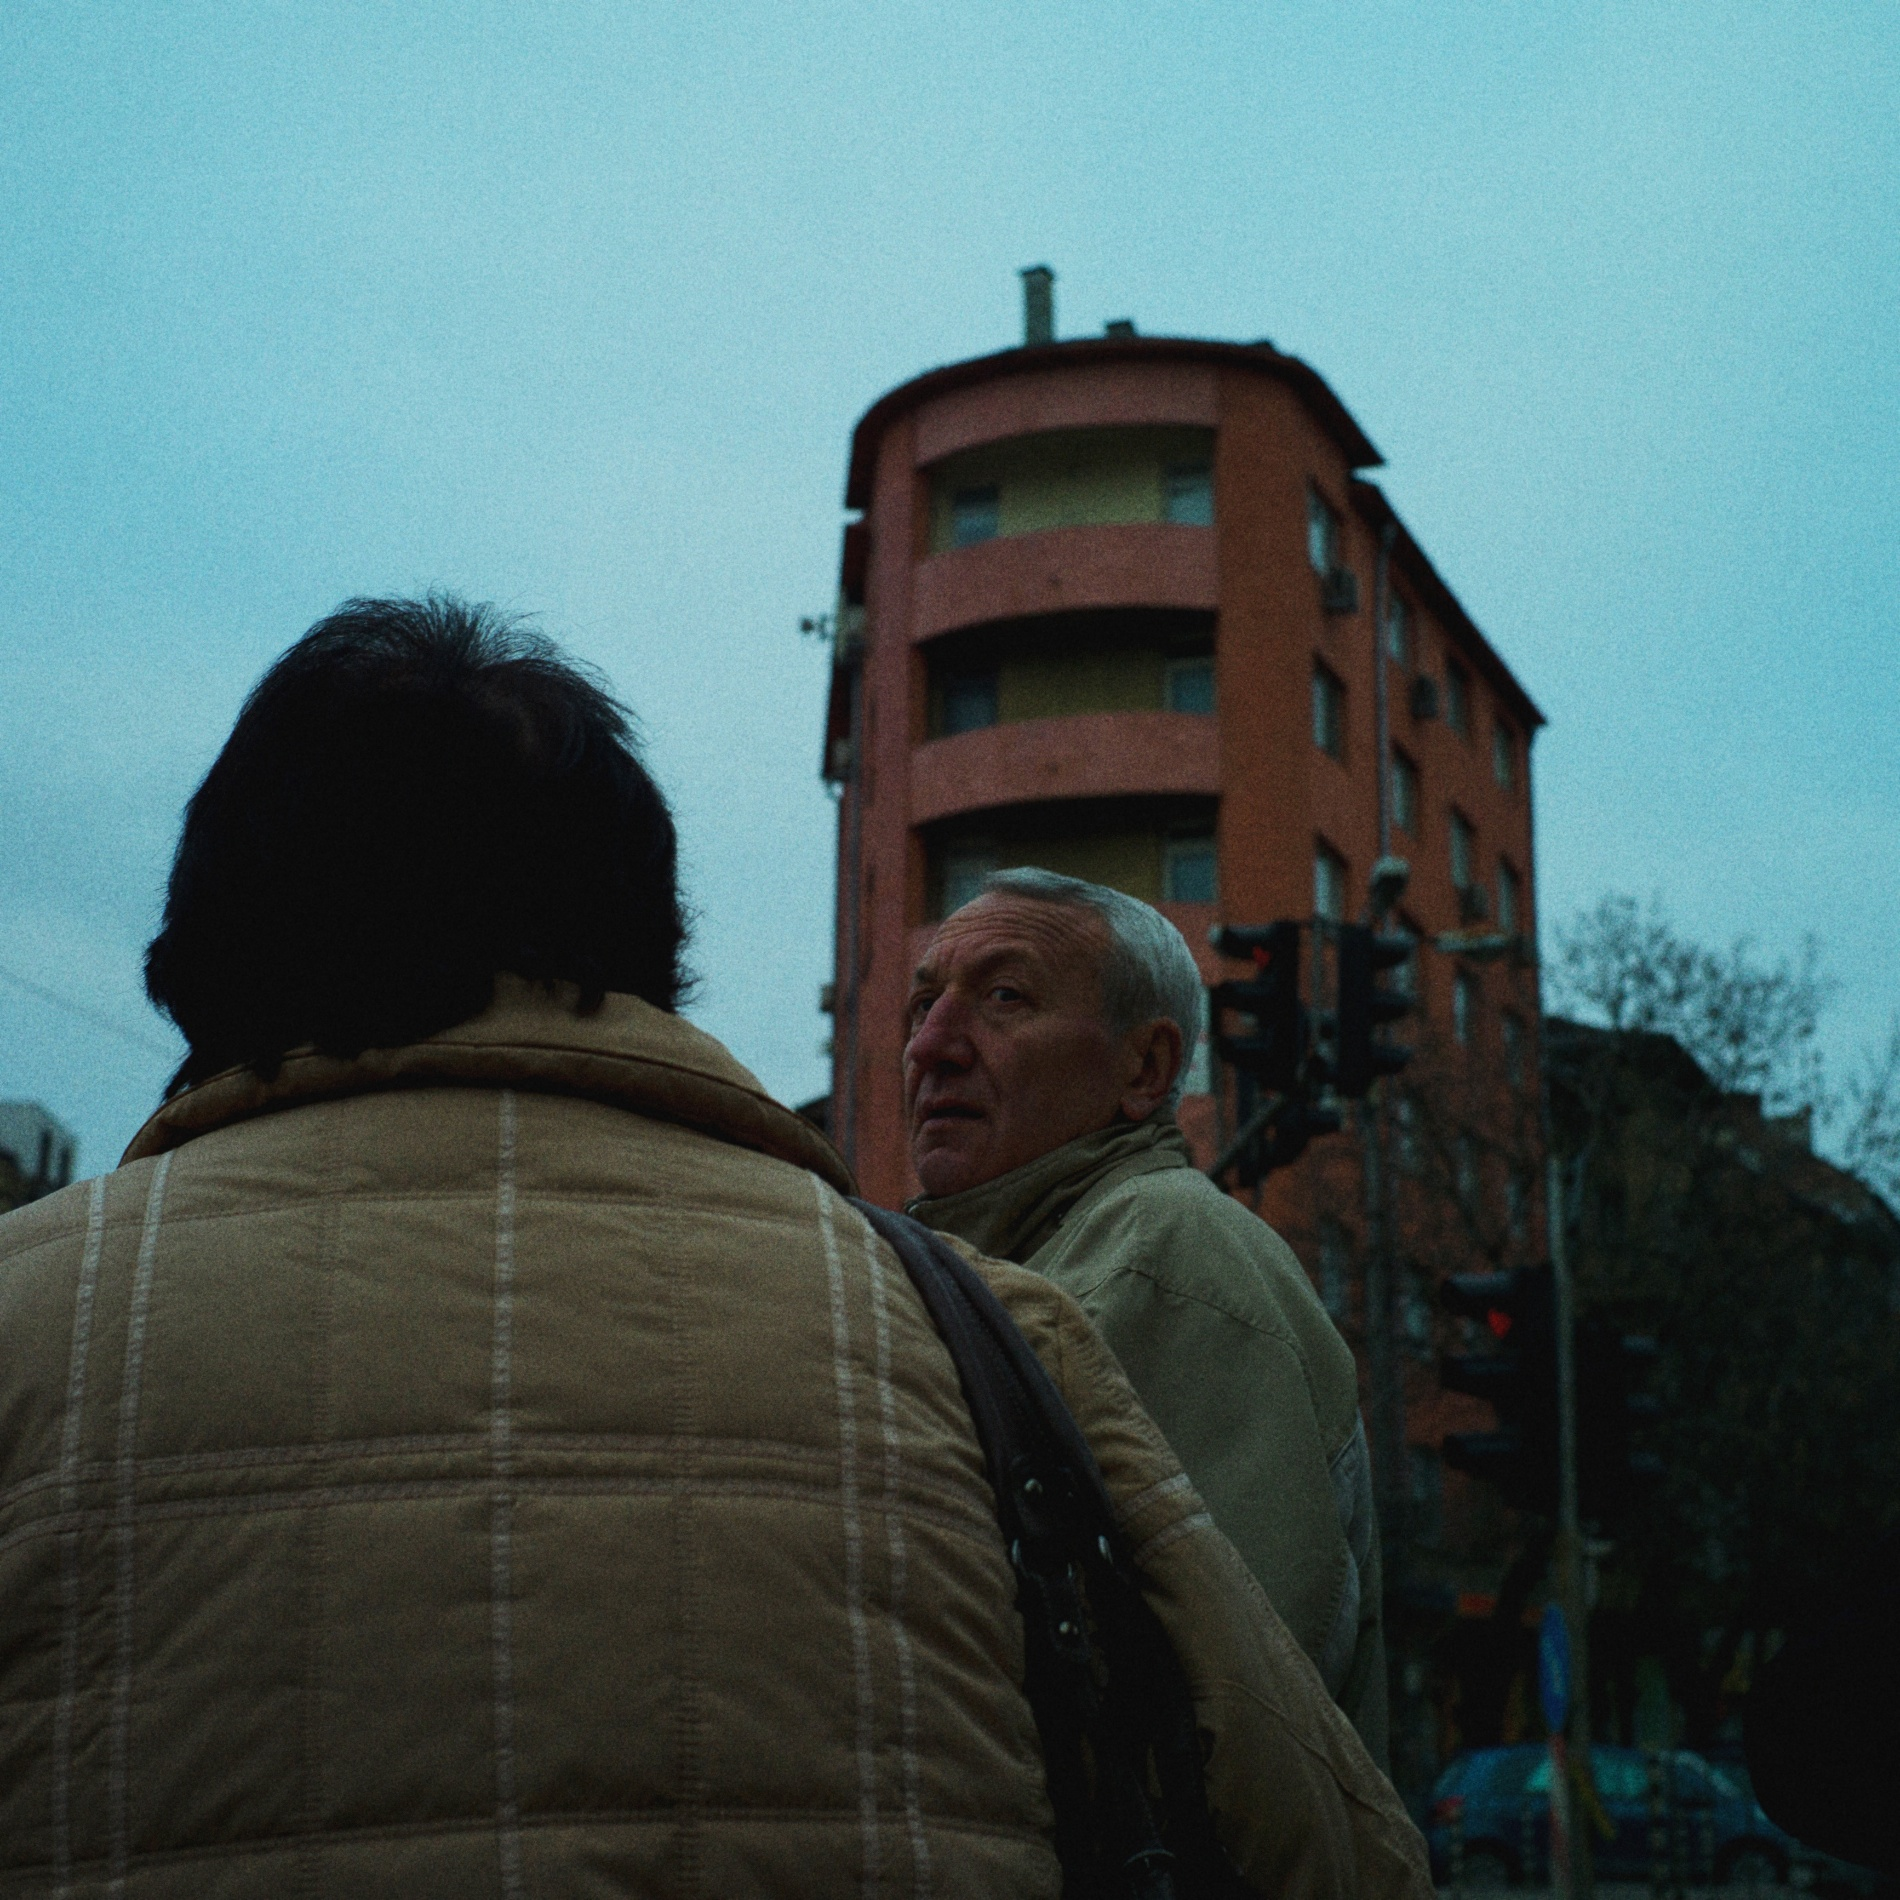 2011-02-23 at 16-12-15, street.jpg